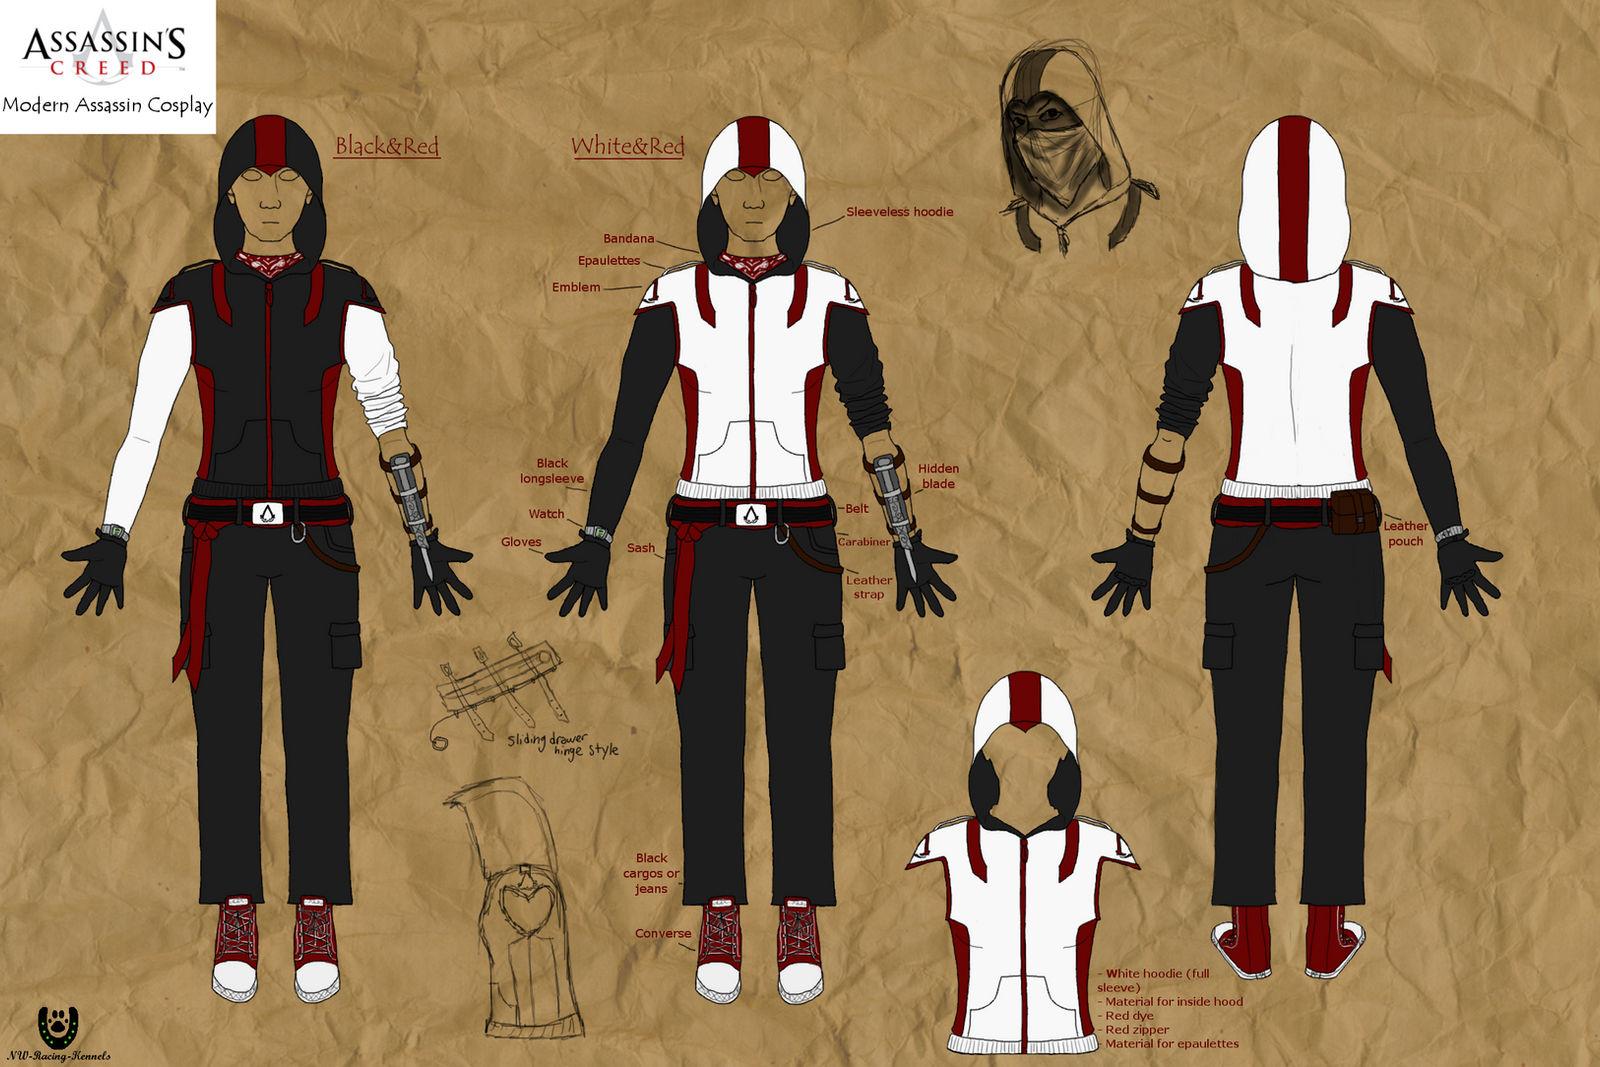 Modern Assassin Cosplay Designs